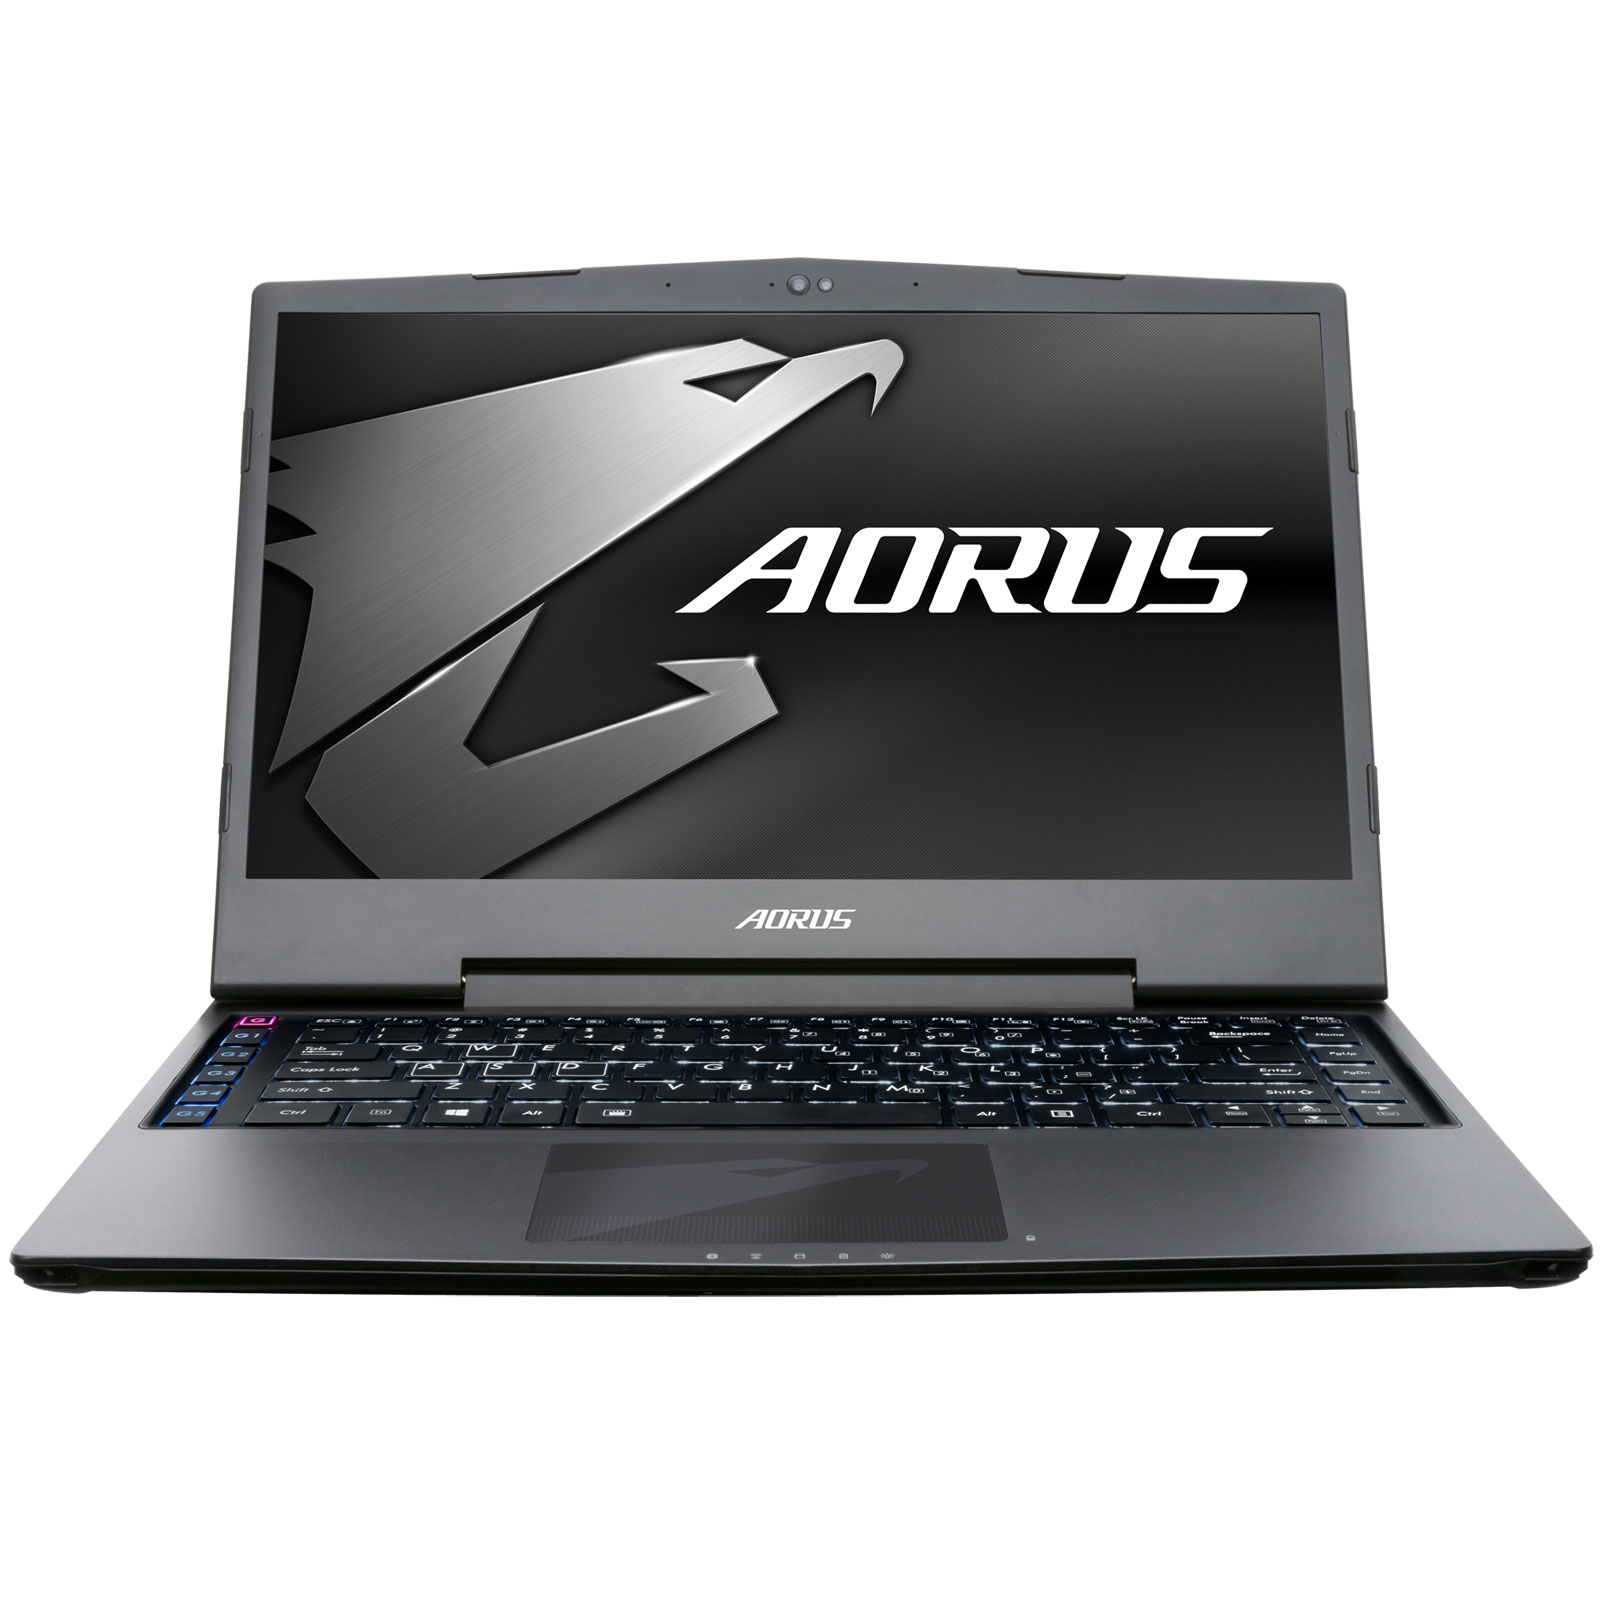 "PC portable AORUS X3 Plus v7 K2NW10-FR Intel Core i7-7820HK 16 Go SSD 1 To (2x 512 Go) 13.9"" LED QHD+ NVIDIA GeForce GTX 1060 6 Go Wi-Fi AC/Bluetooth Webcam Windows 10 Famille 64 bits"